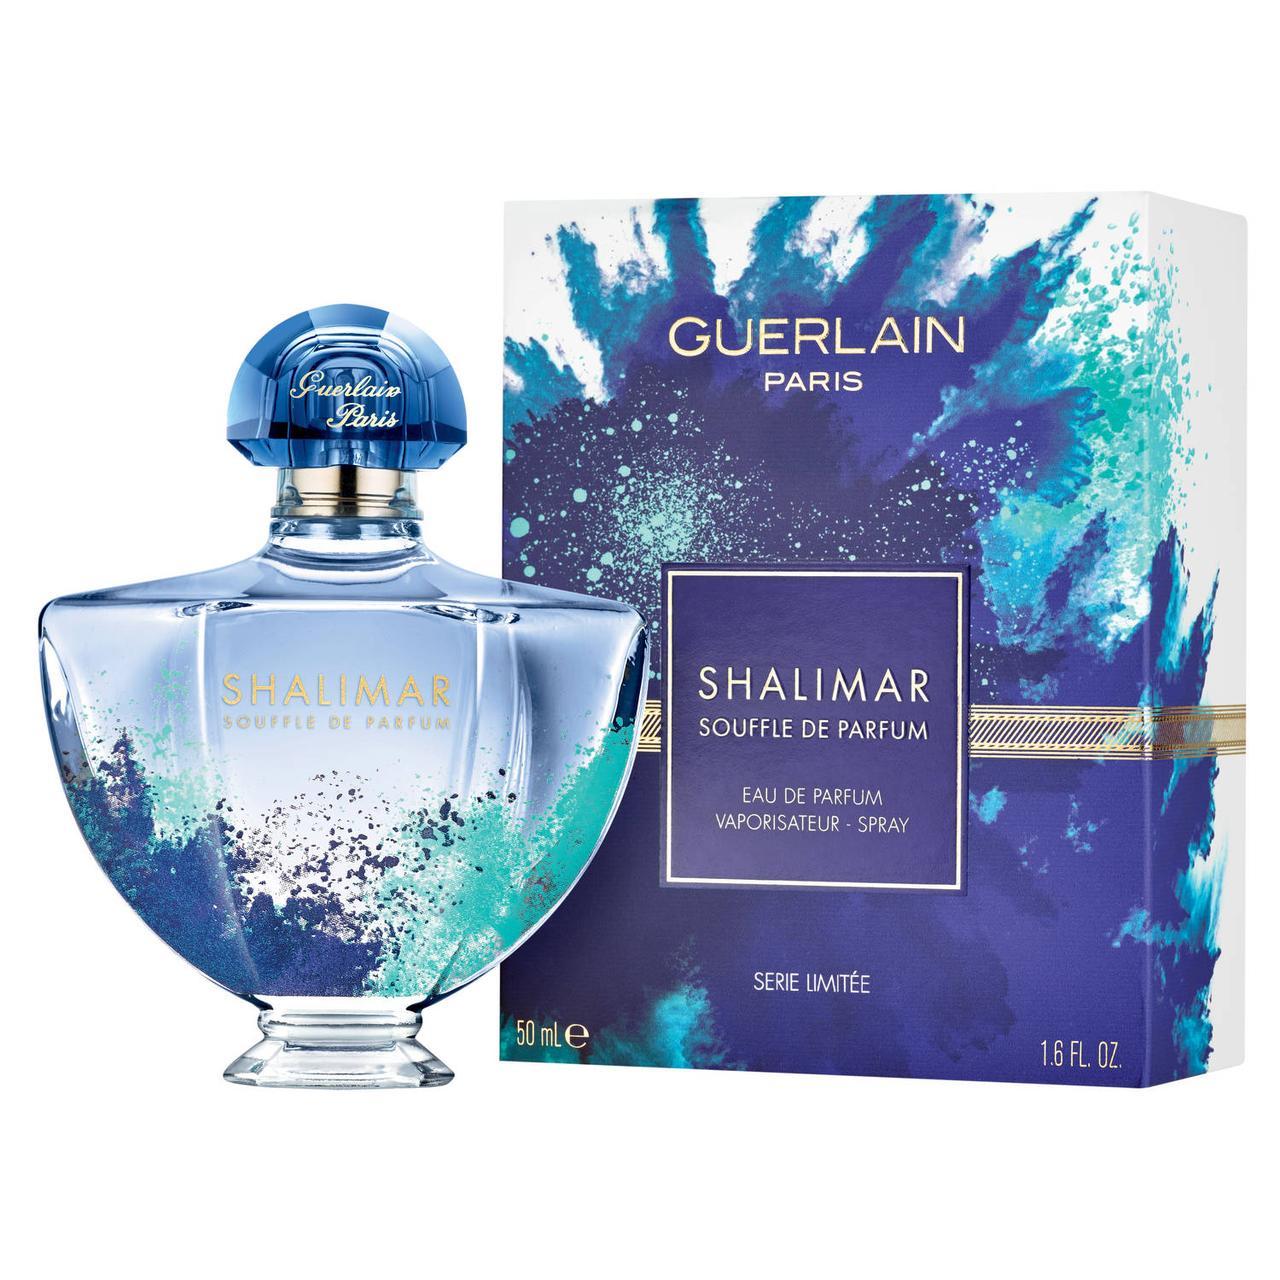 оригинал Guerlain Shalimar Souffle De Parfum Edition Limitee 50ml